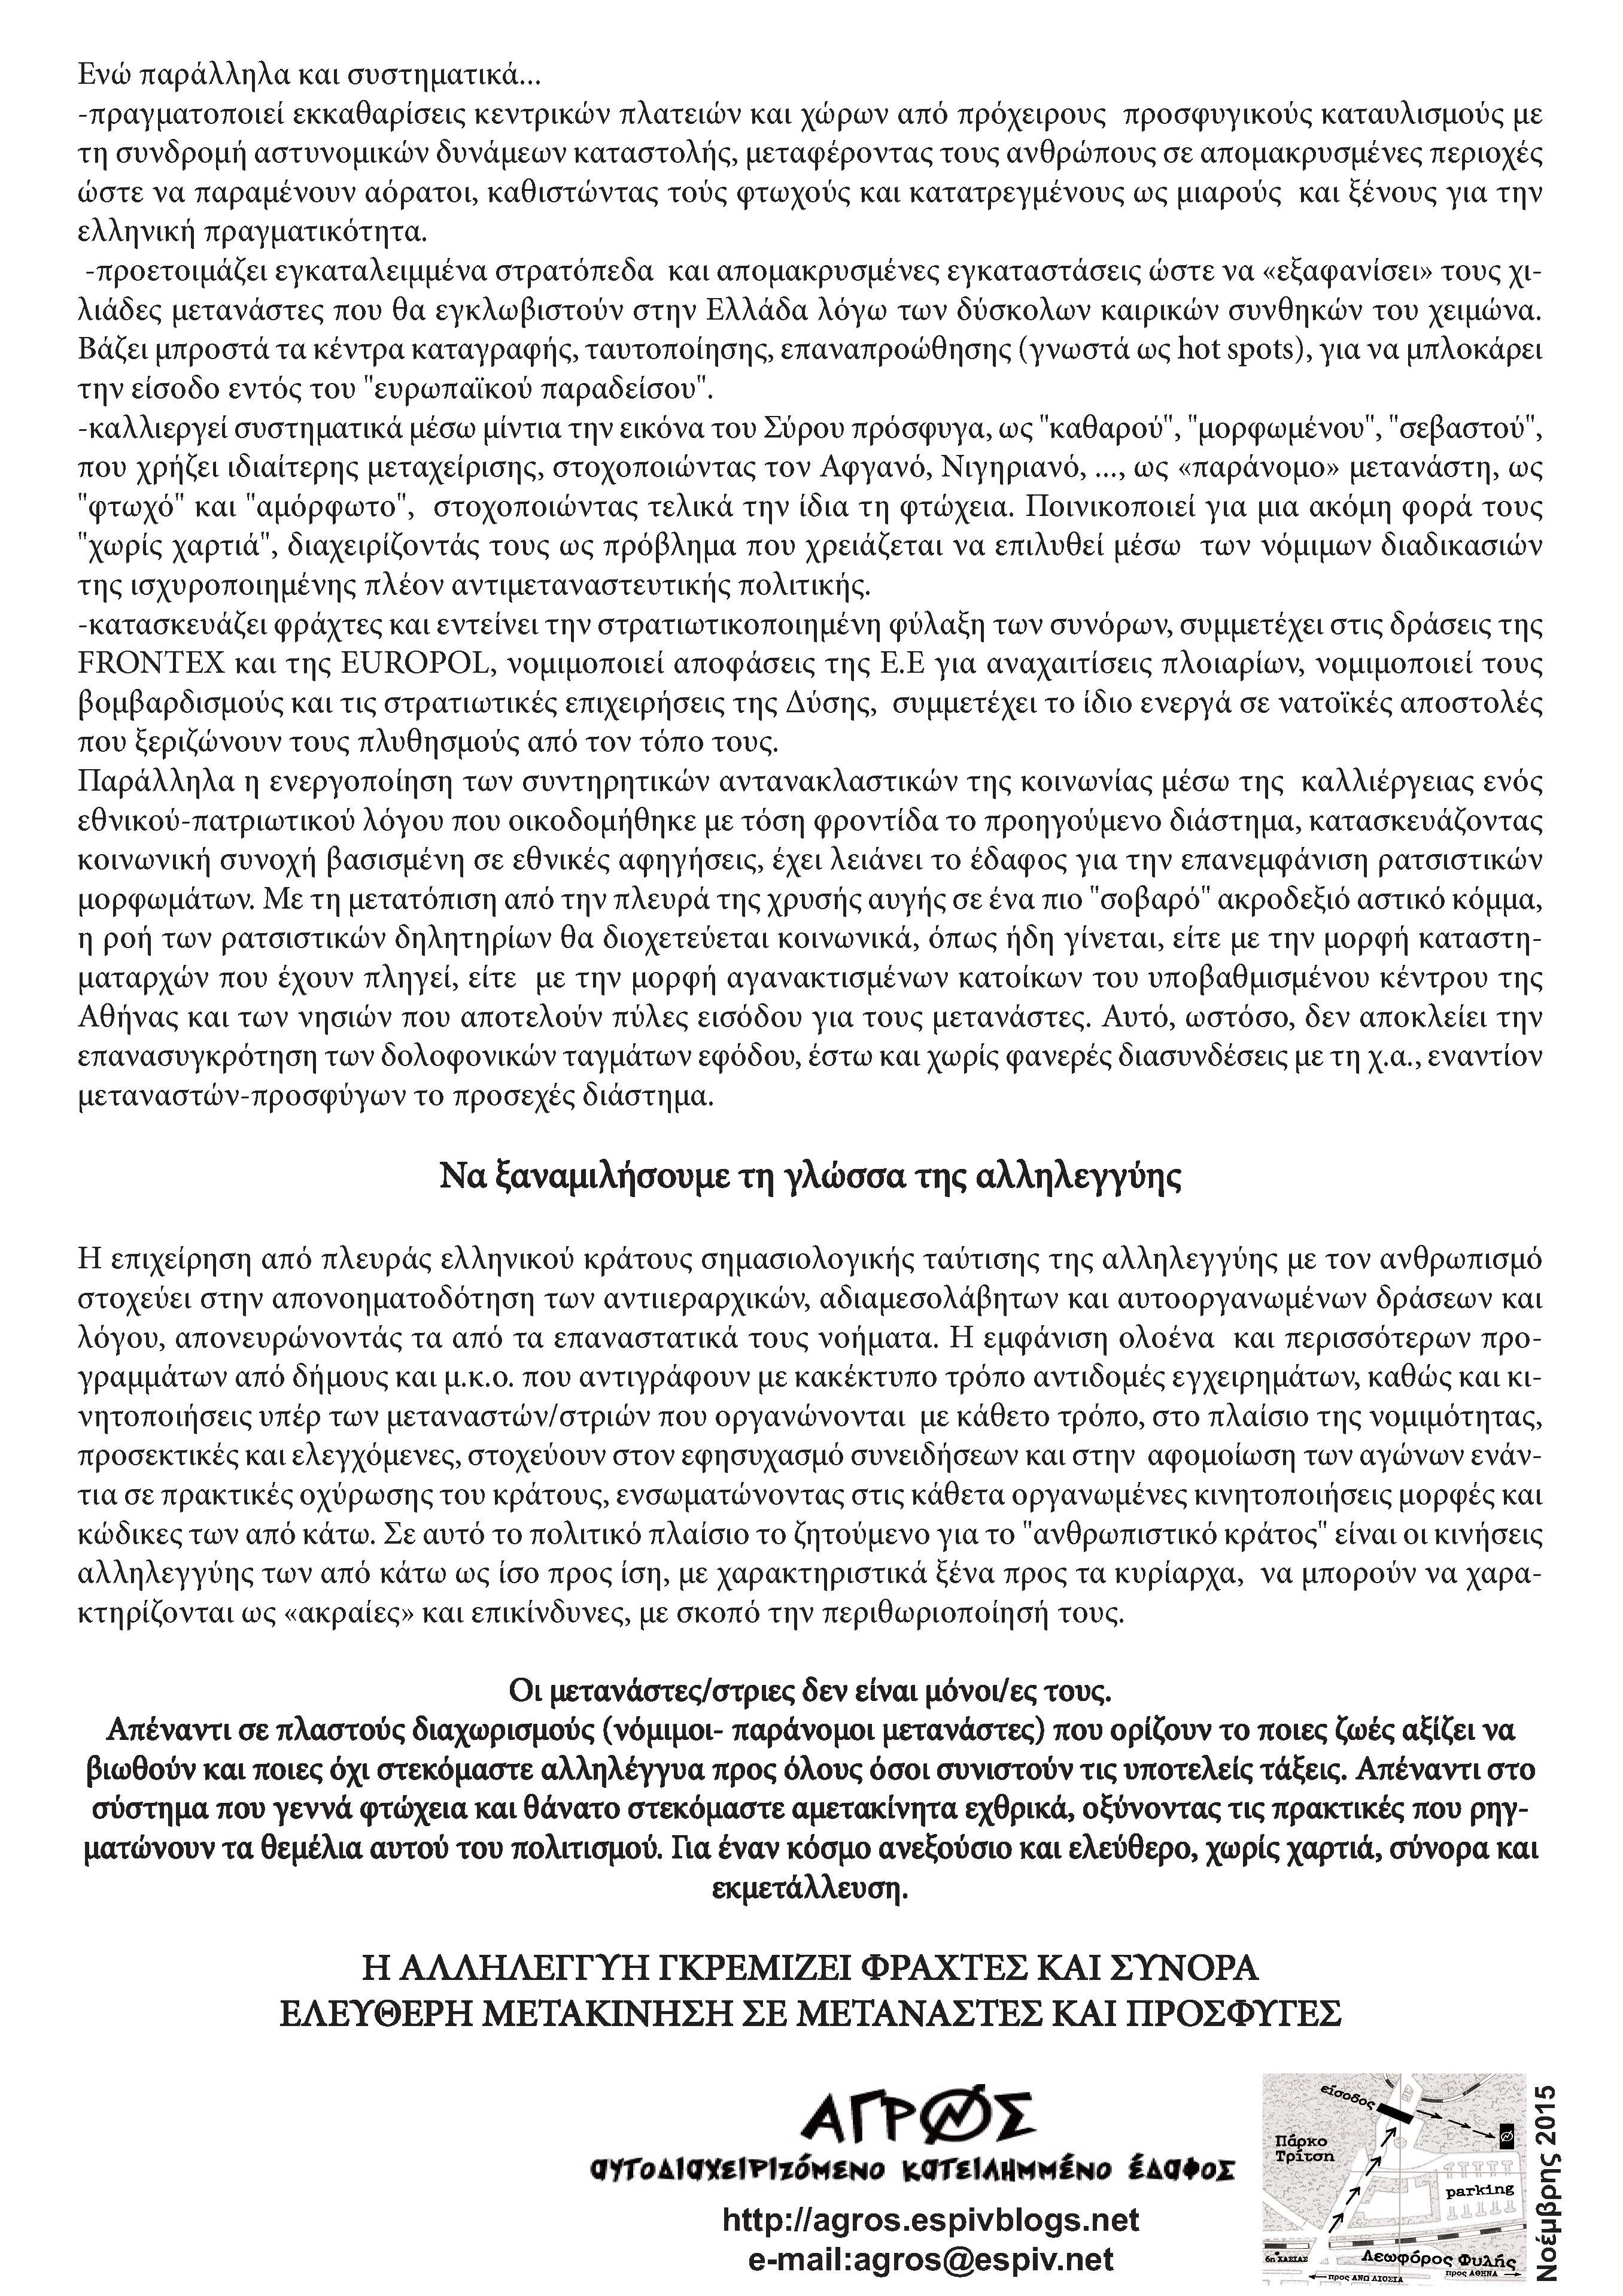 keimeno 14-11-15_Page_2